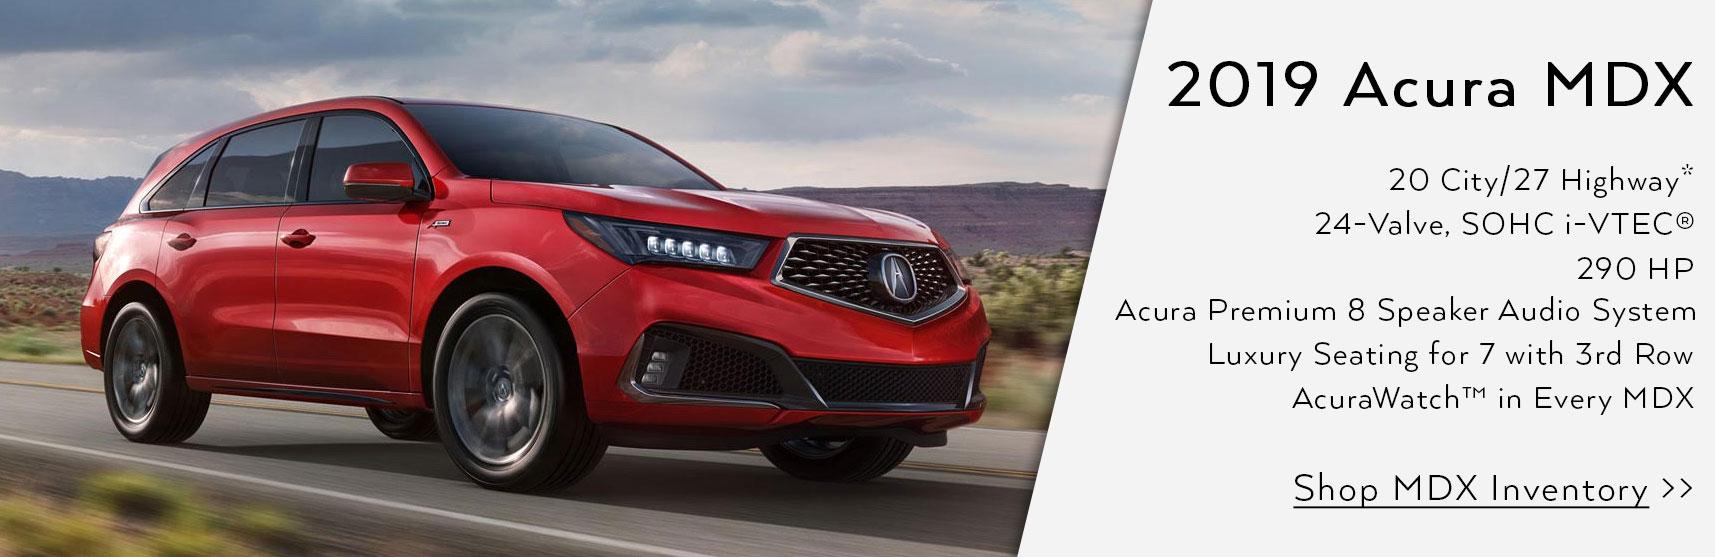 2019 Acura Mdx Review Specs Acura Of Stockton New Used Acuras